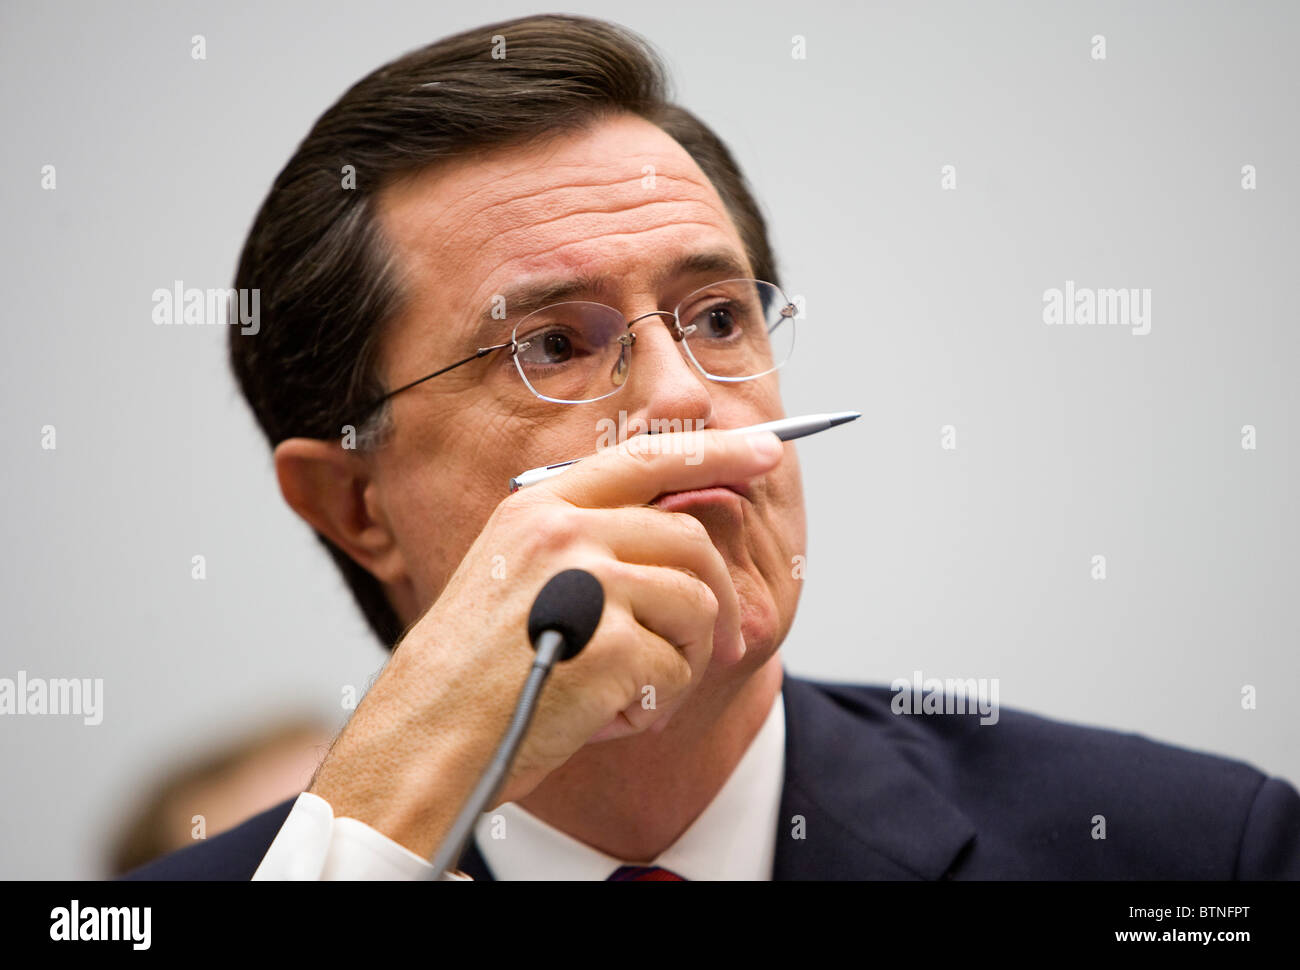 Actor and comedian Stephen Colbert testifies before Congress.  - Stock Image